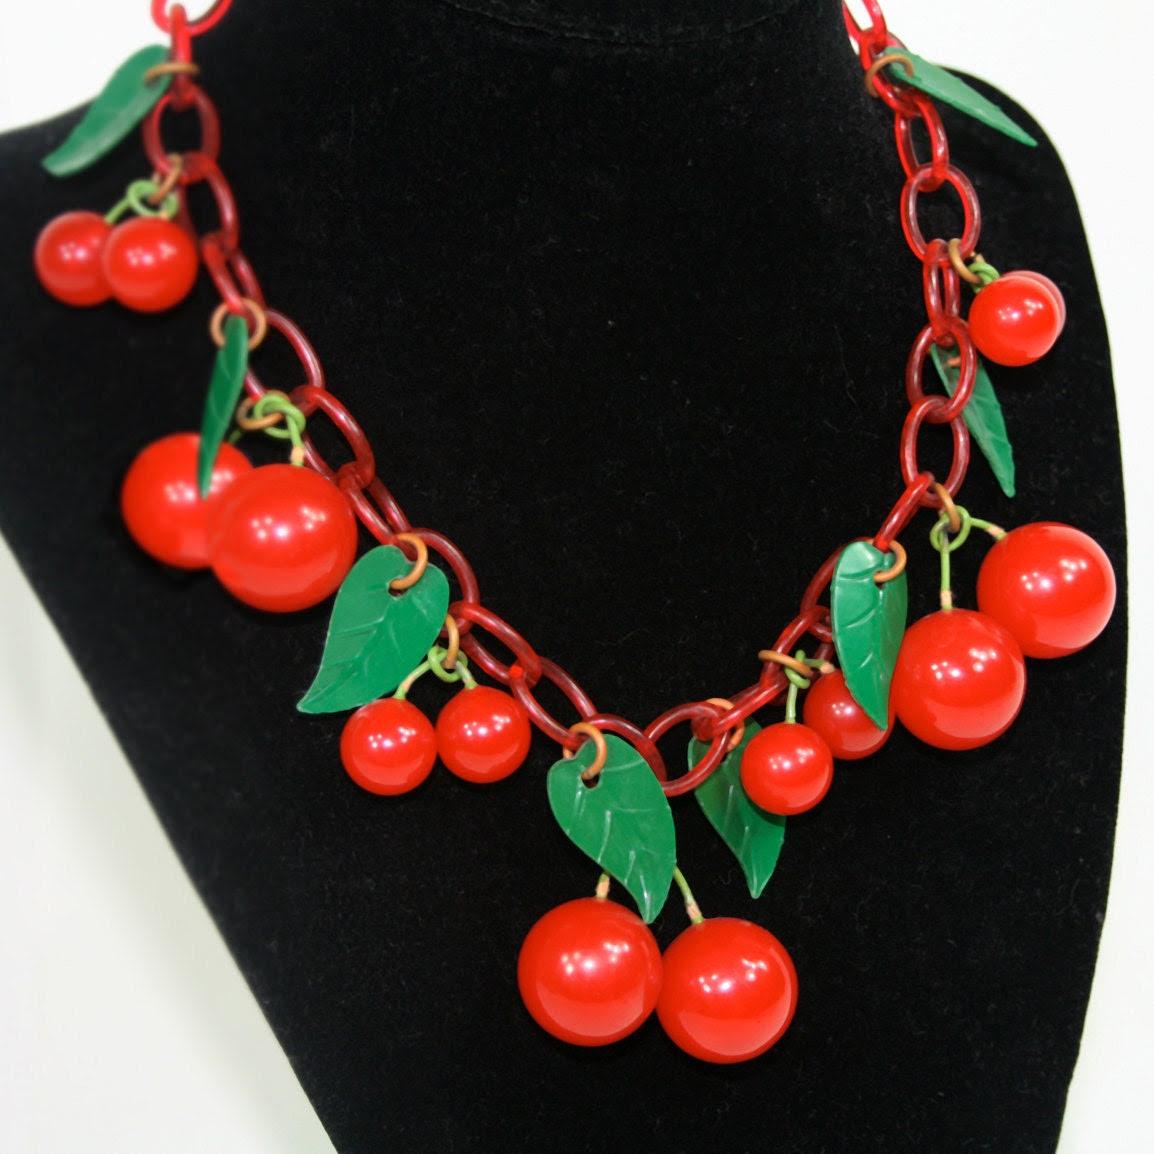 Vintage Bakelite Cherry Necklace